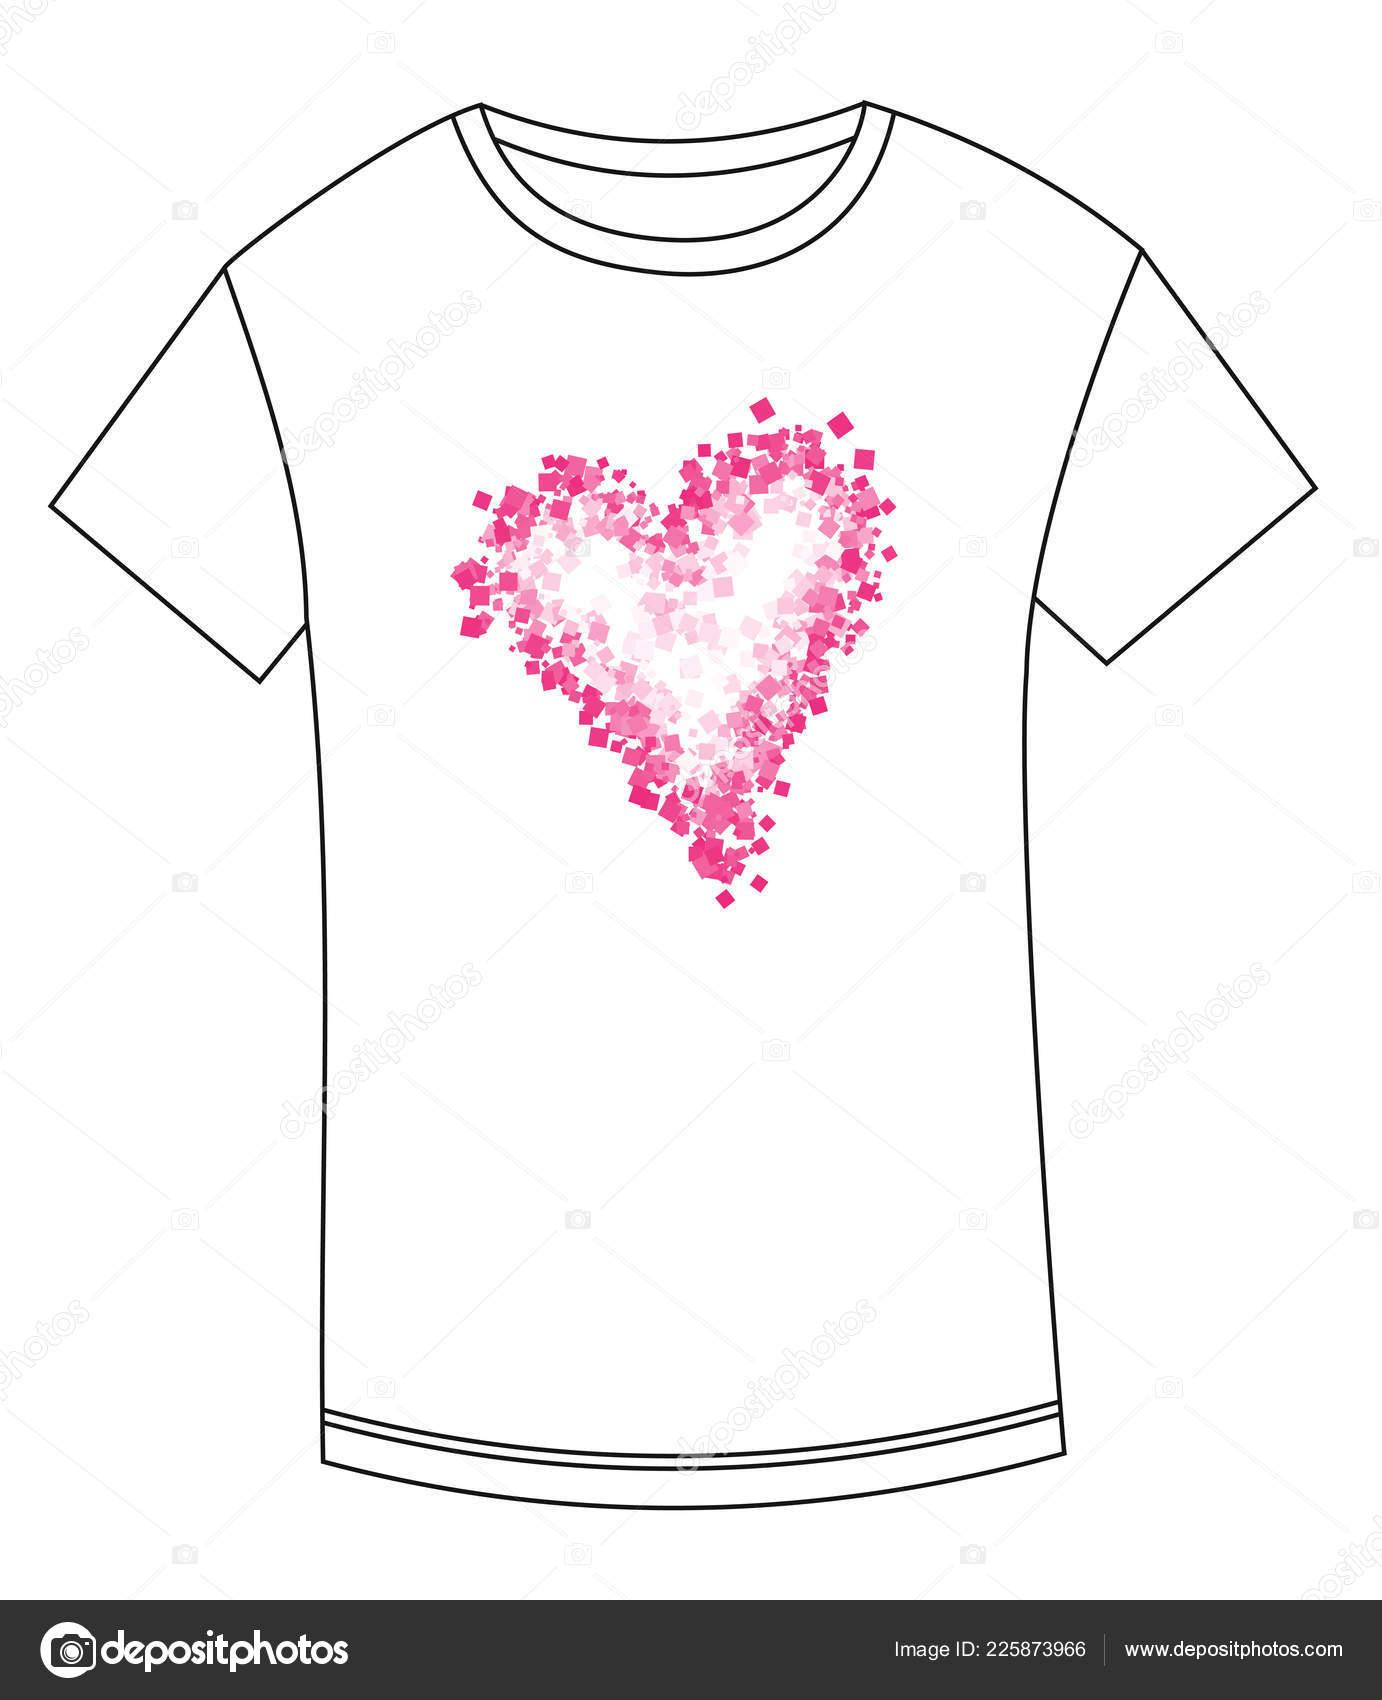 1969db337f17 Tričko Abstraktní Kresba Srdce Srdce Tisk Trička Srdce Valentýna Triko —  Stockový vektor